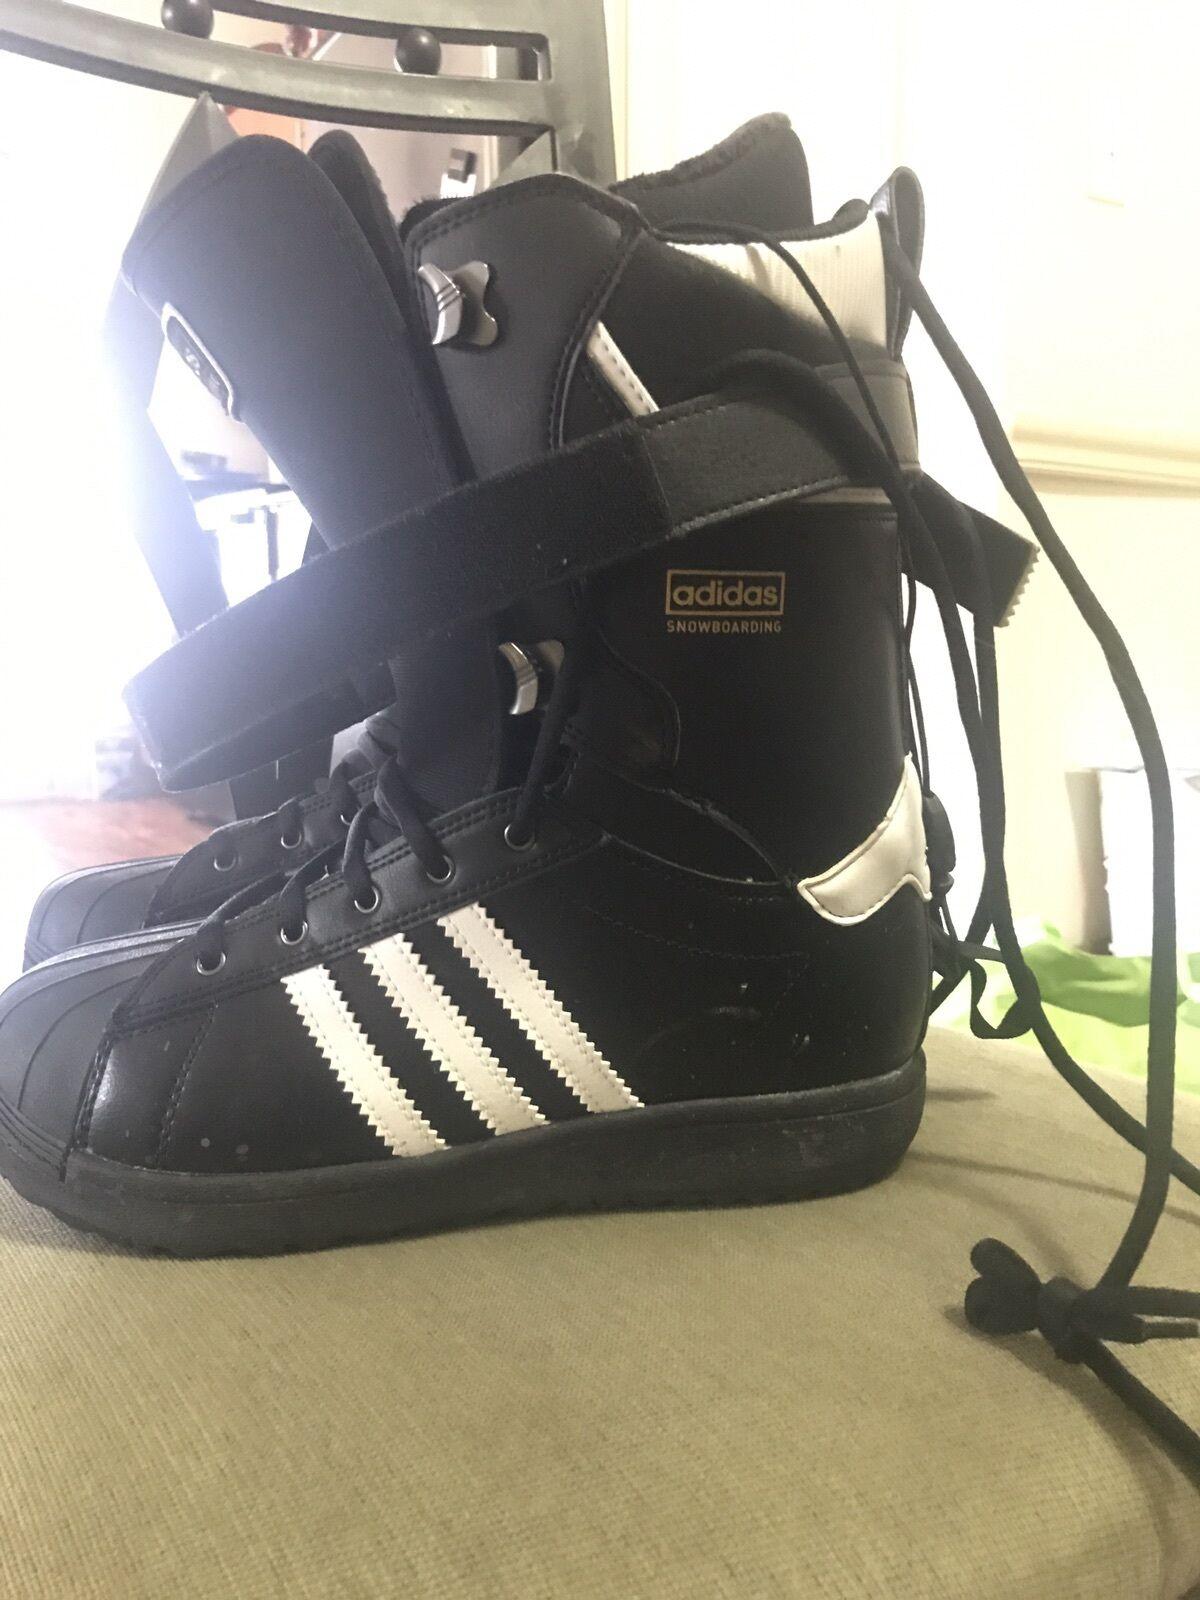 Adidas Original Snowboarding Boots Size 10